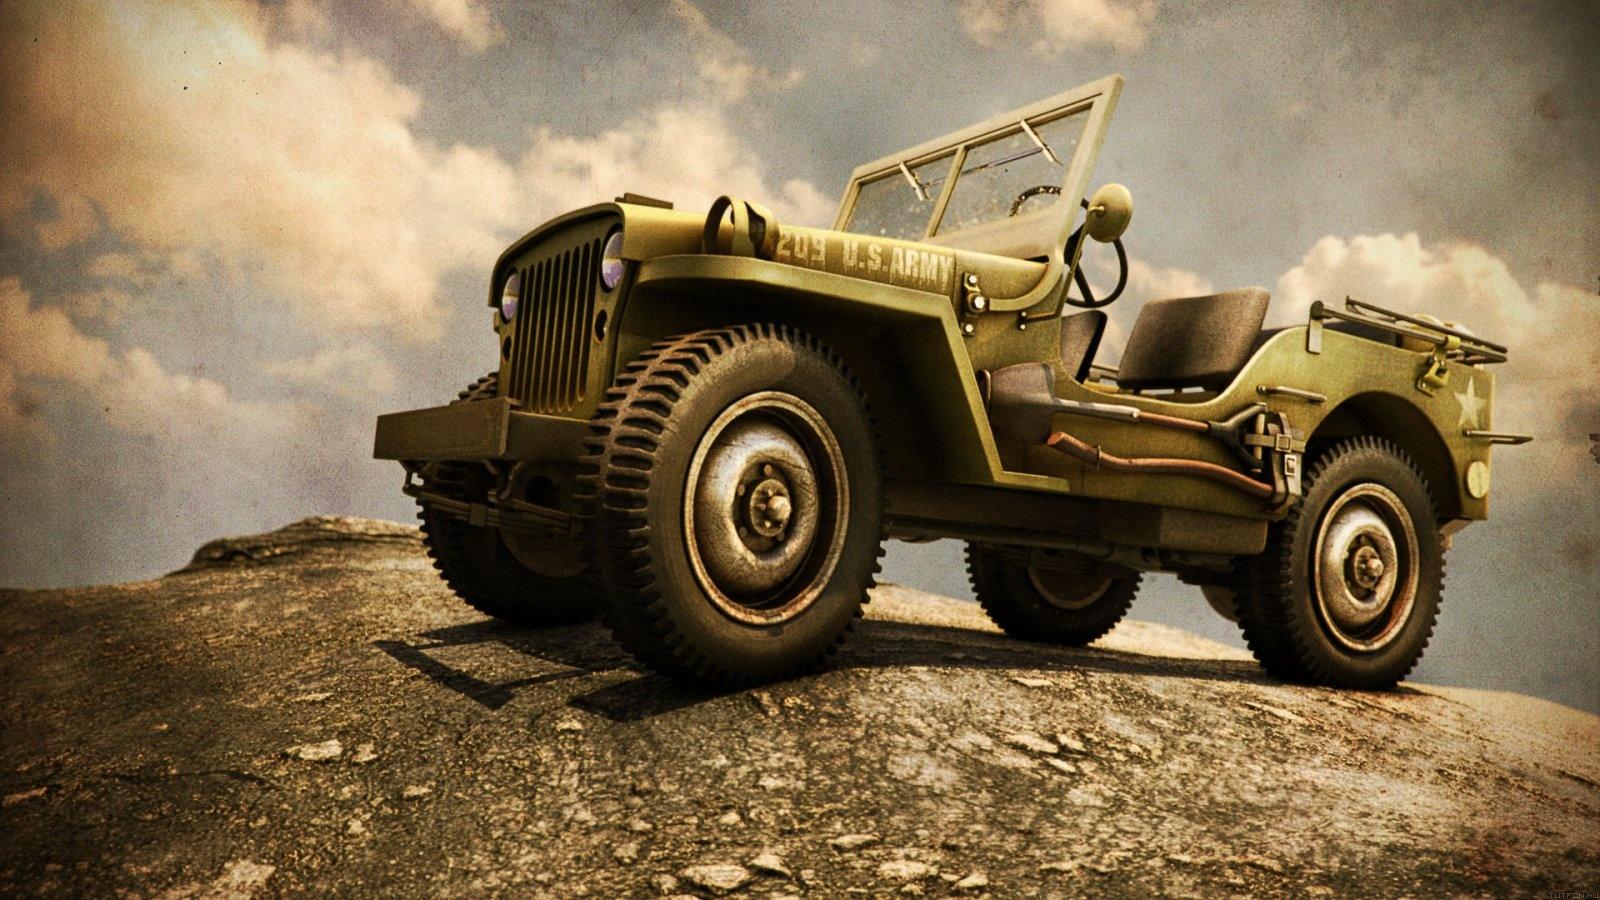 Обои фото, тачки, ford, raptor, джипы картинки на рабочий стол ... | 900x1600